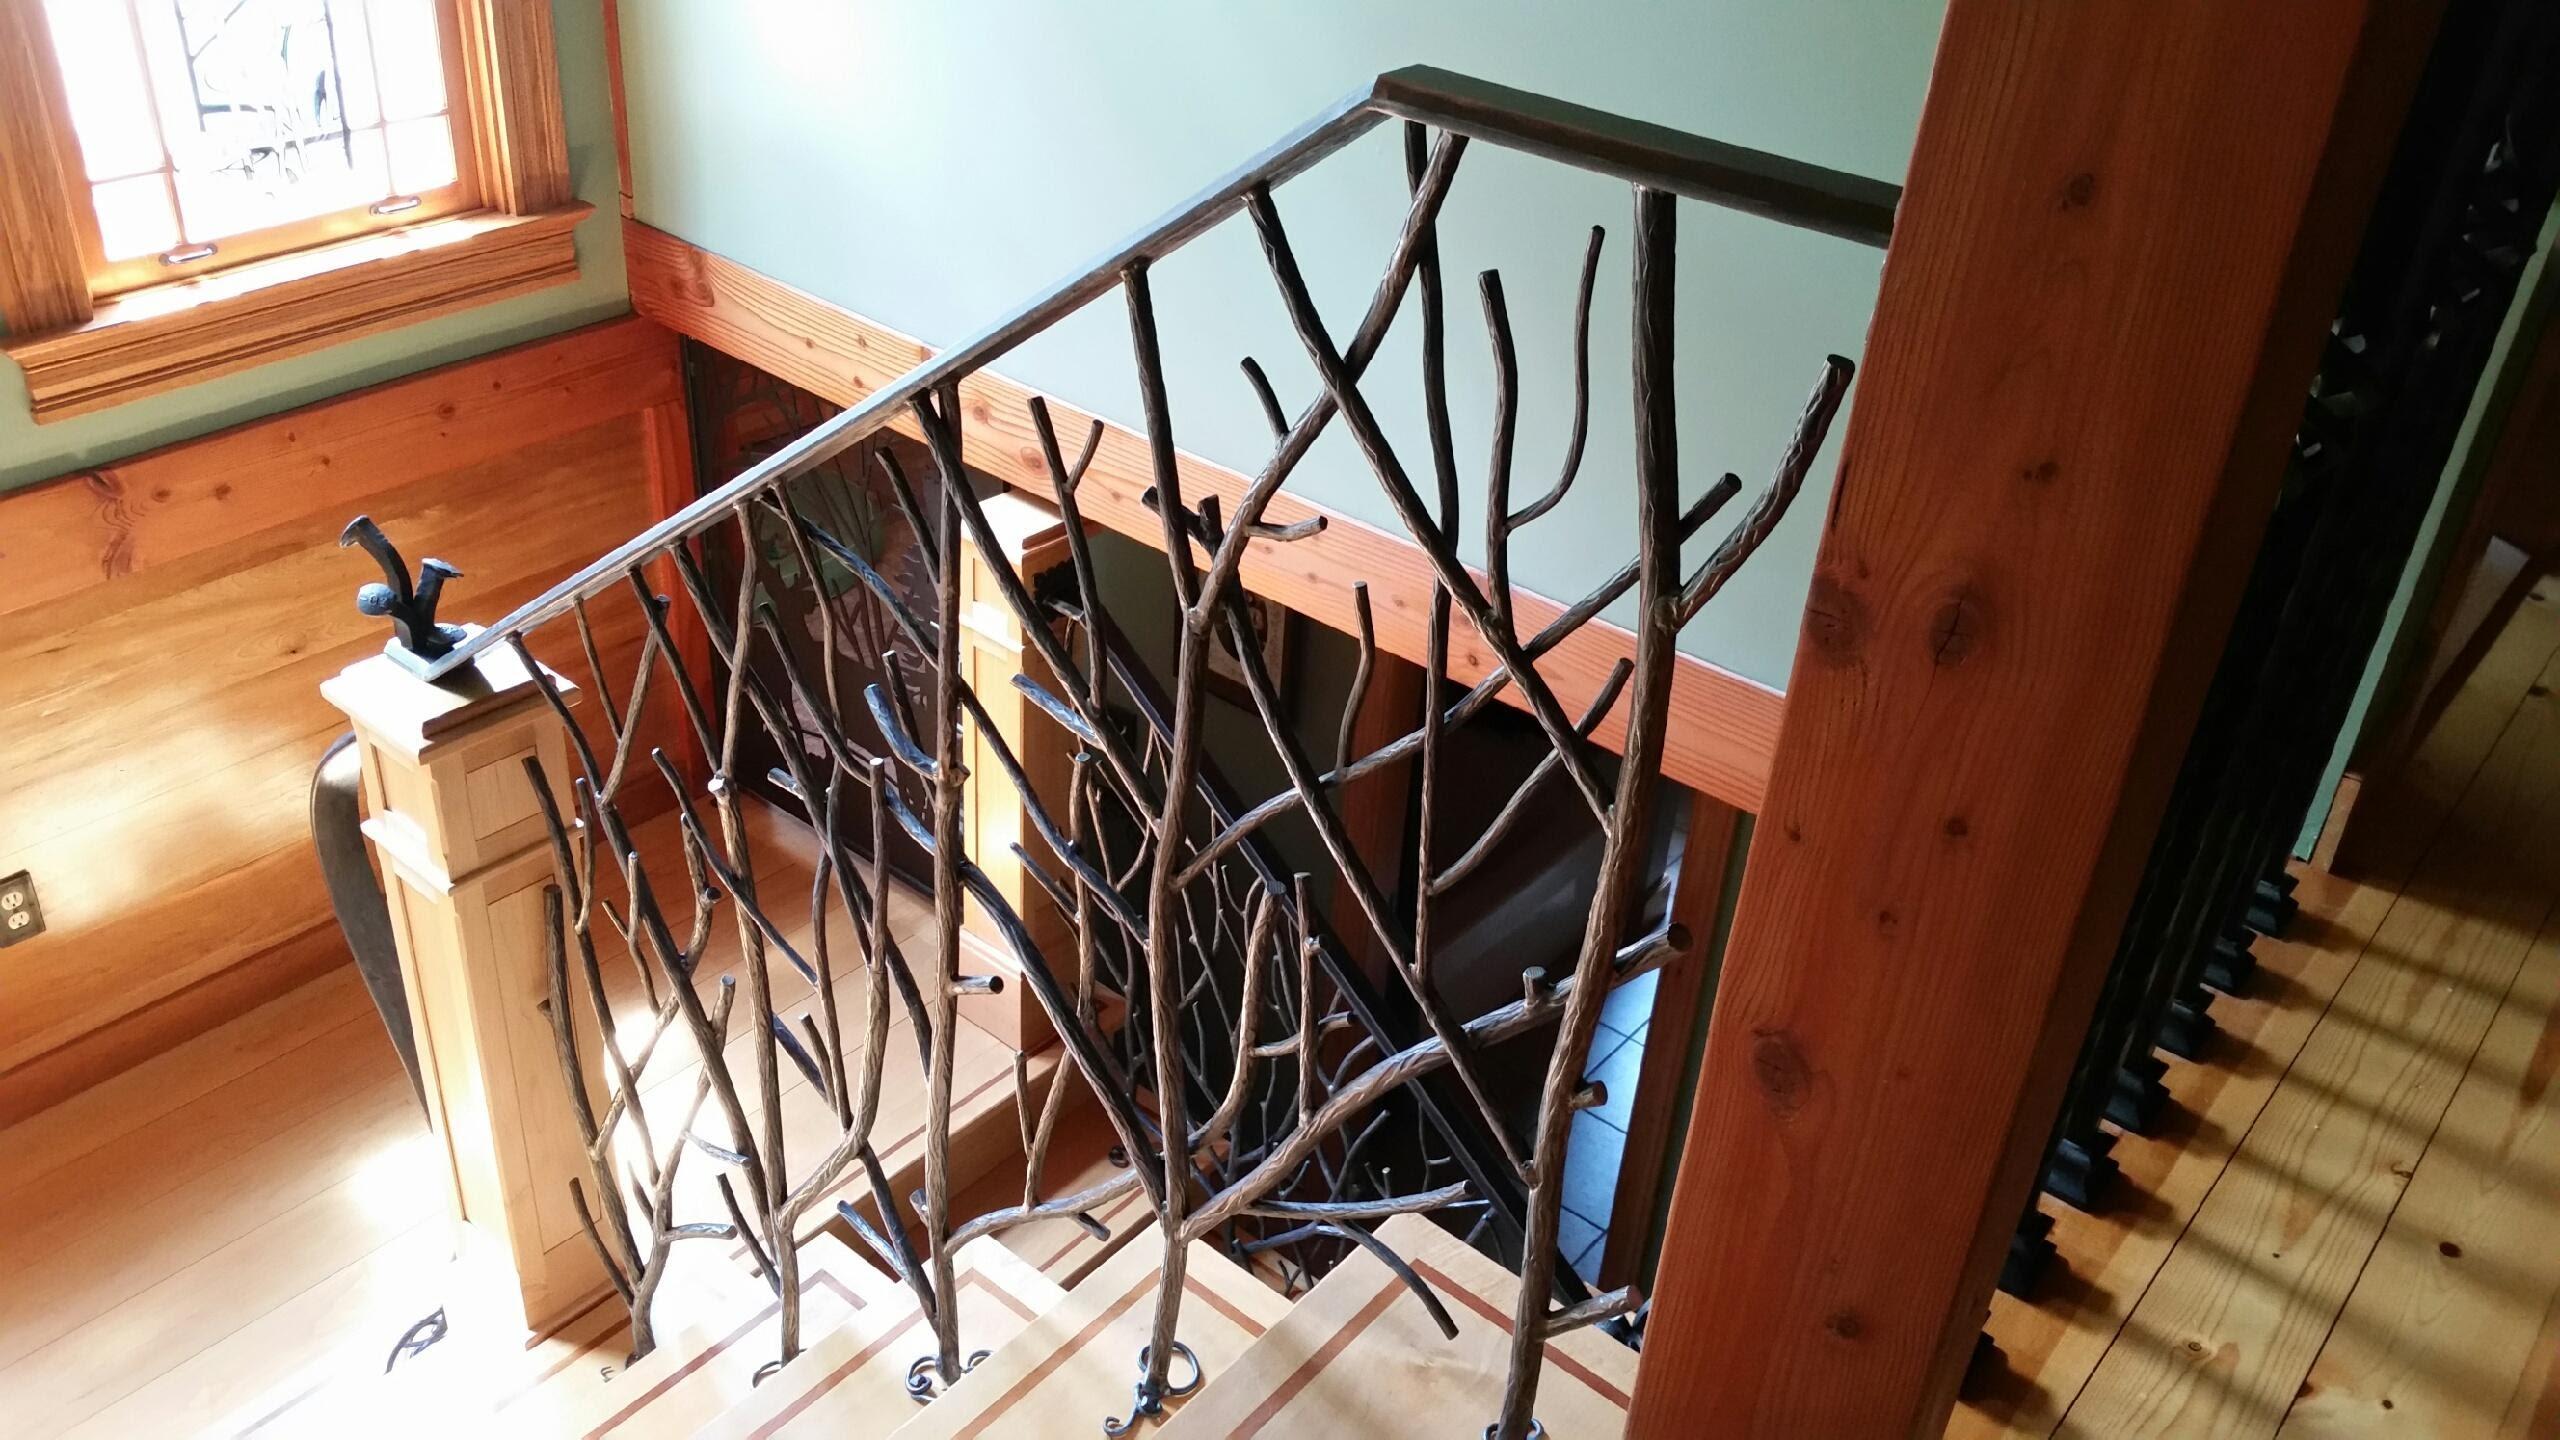 Tree Handrailings